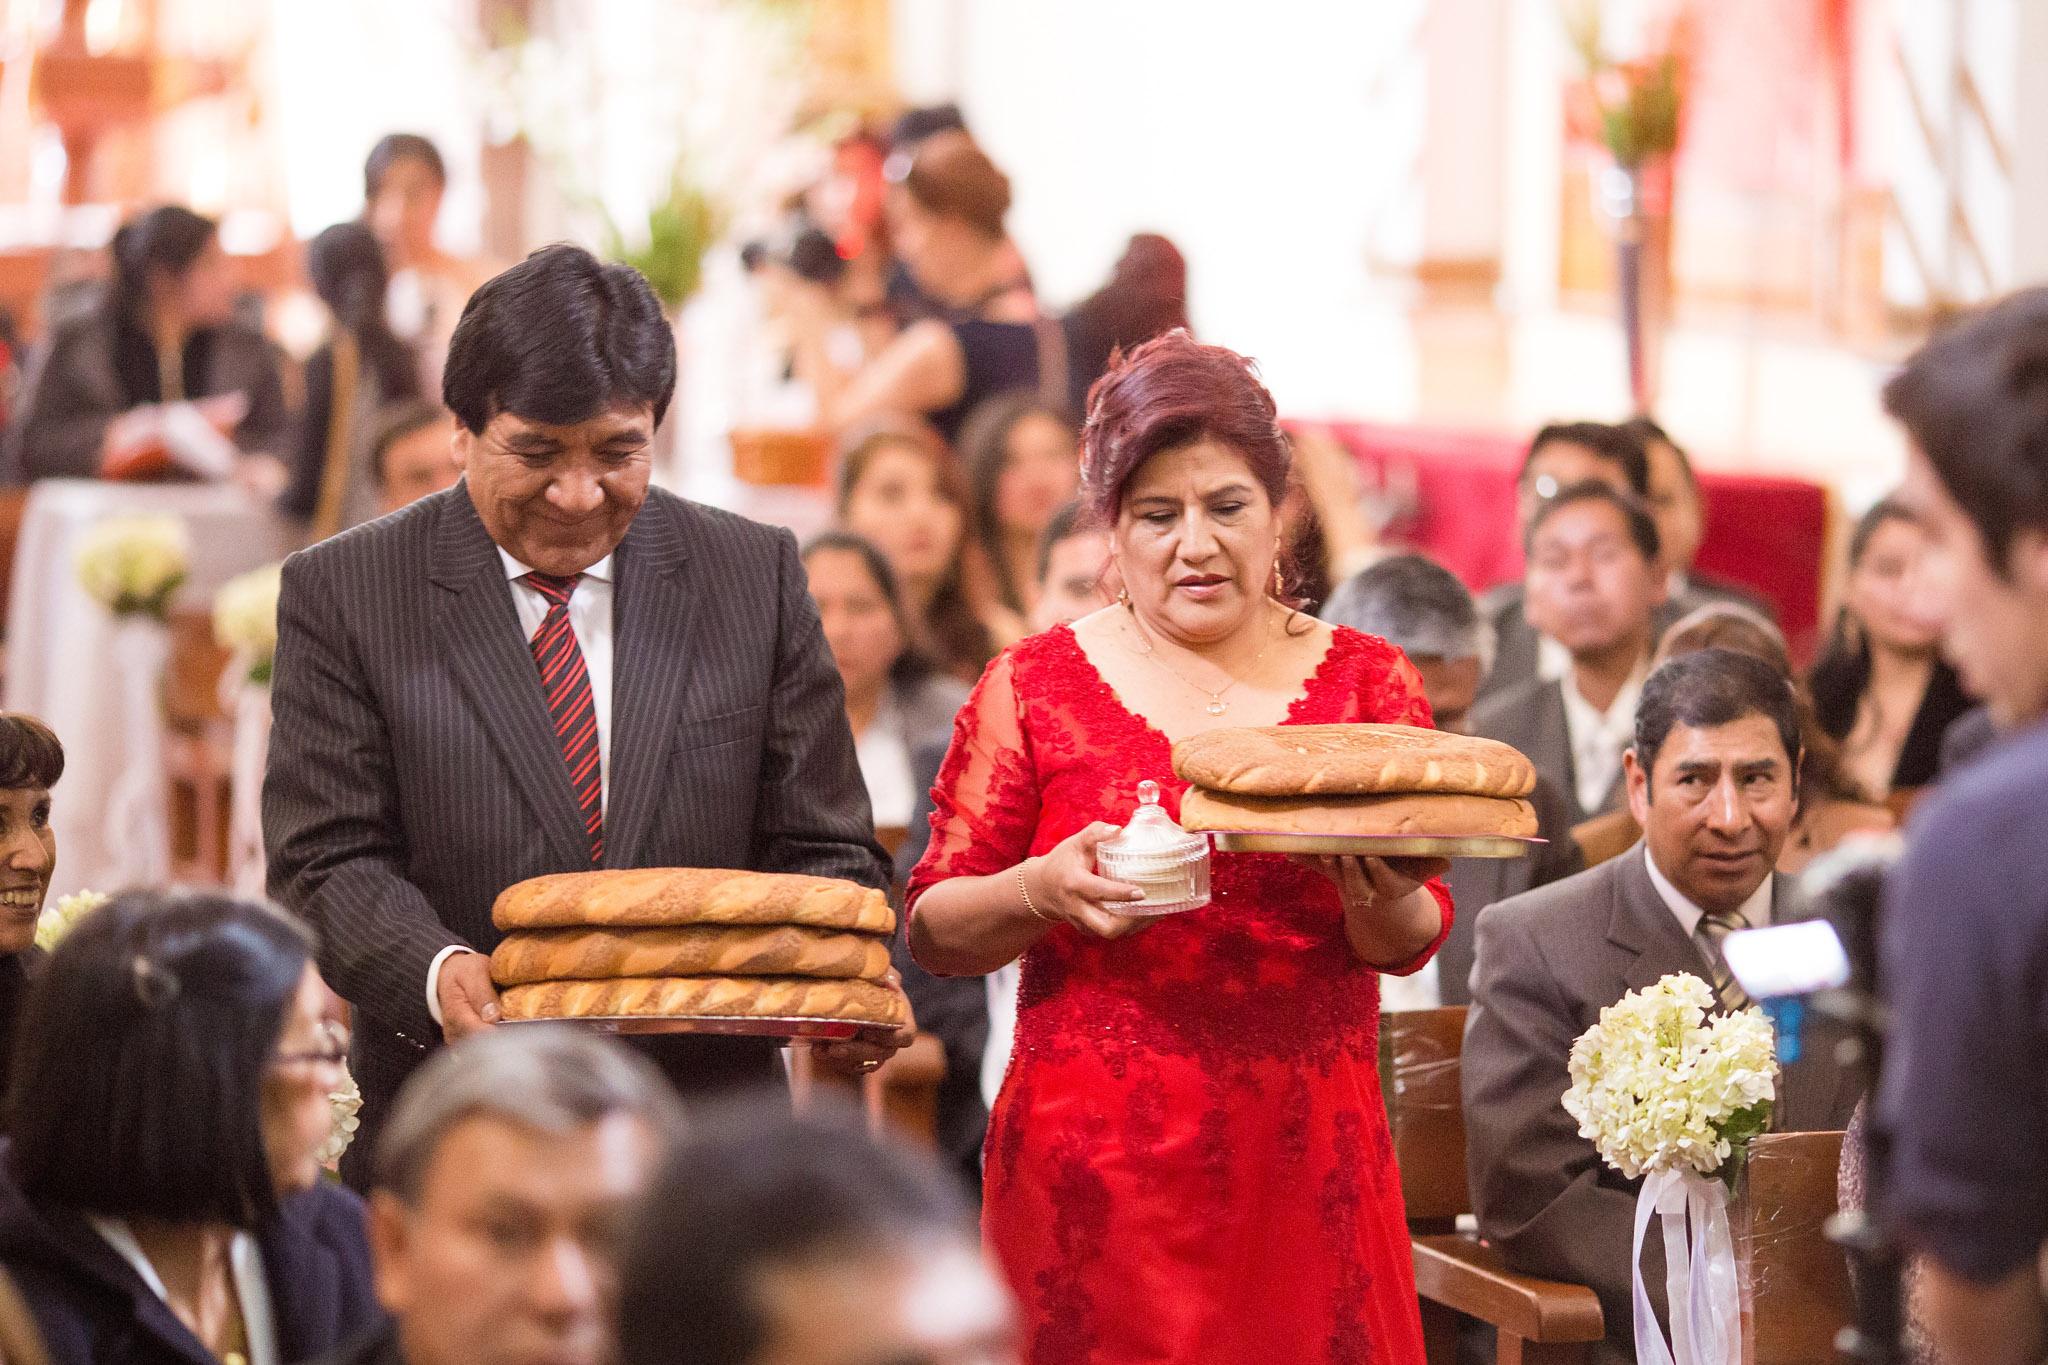 Wedding-Travellers-Destination-Wedding-Peru-Cusco-Hacienda-Sarapampa-Sacred-Valley-church-traditions-bread